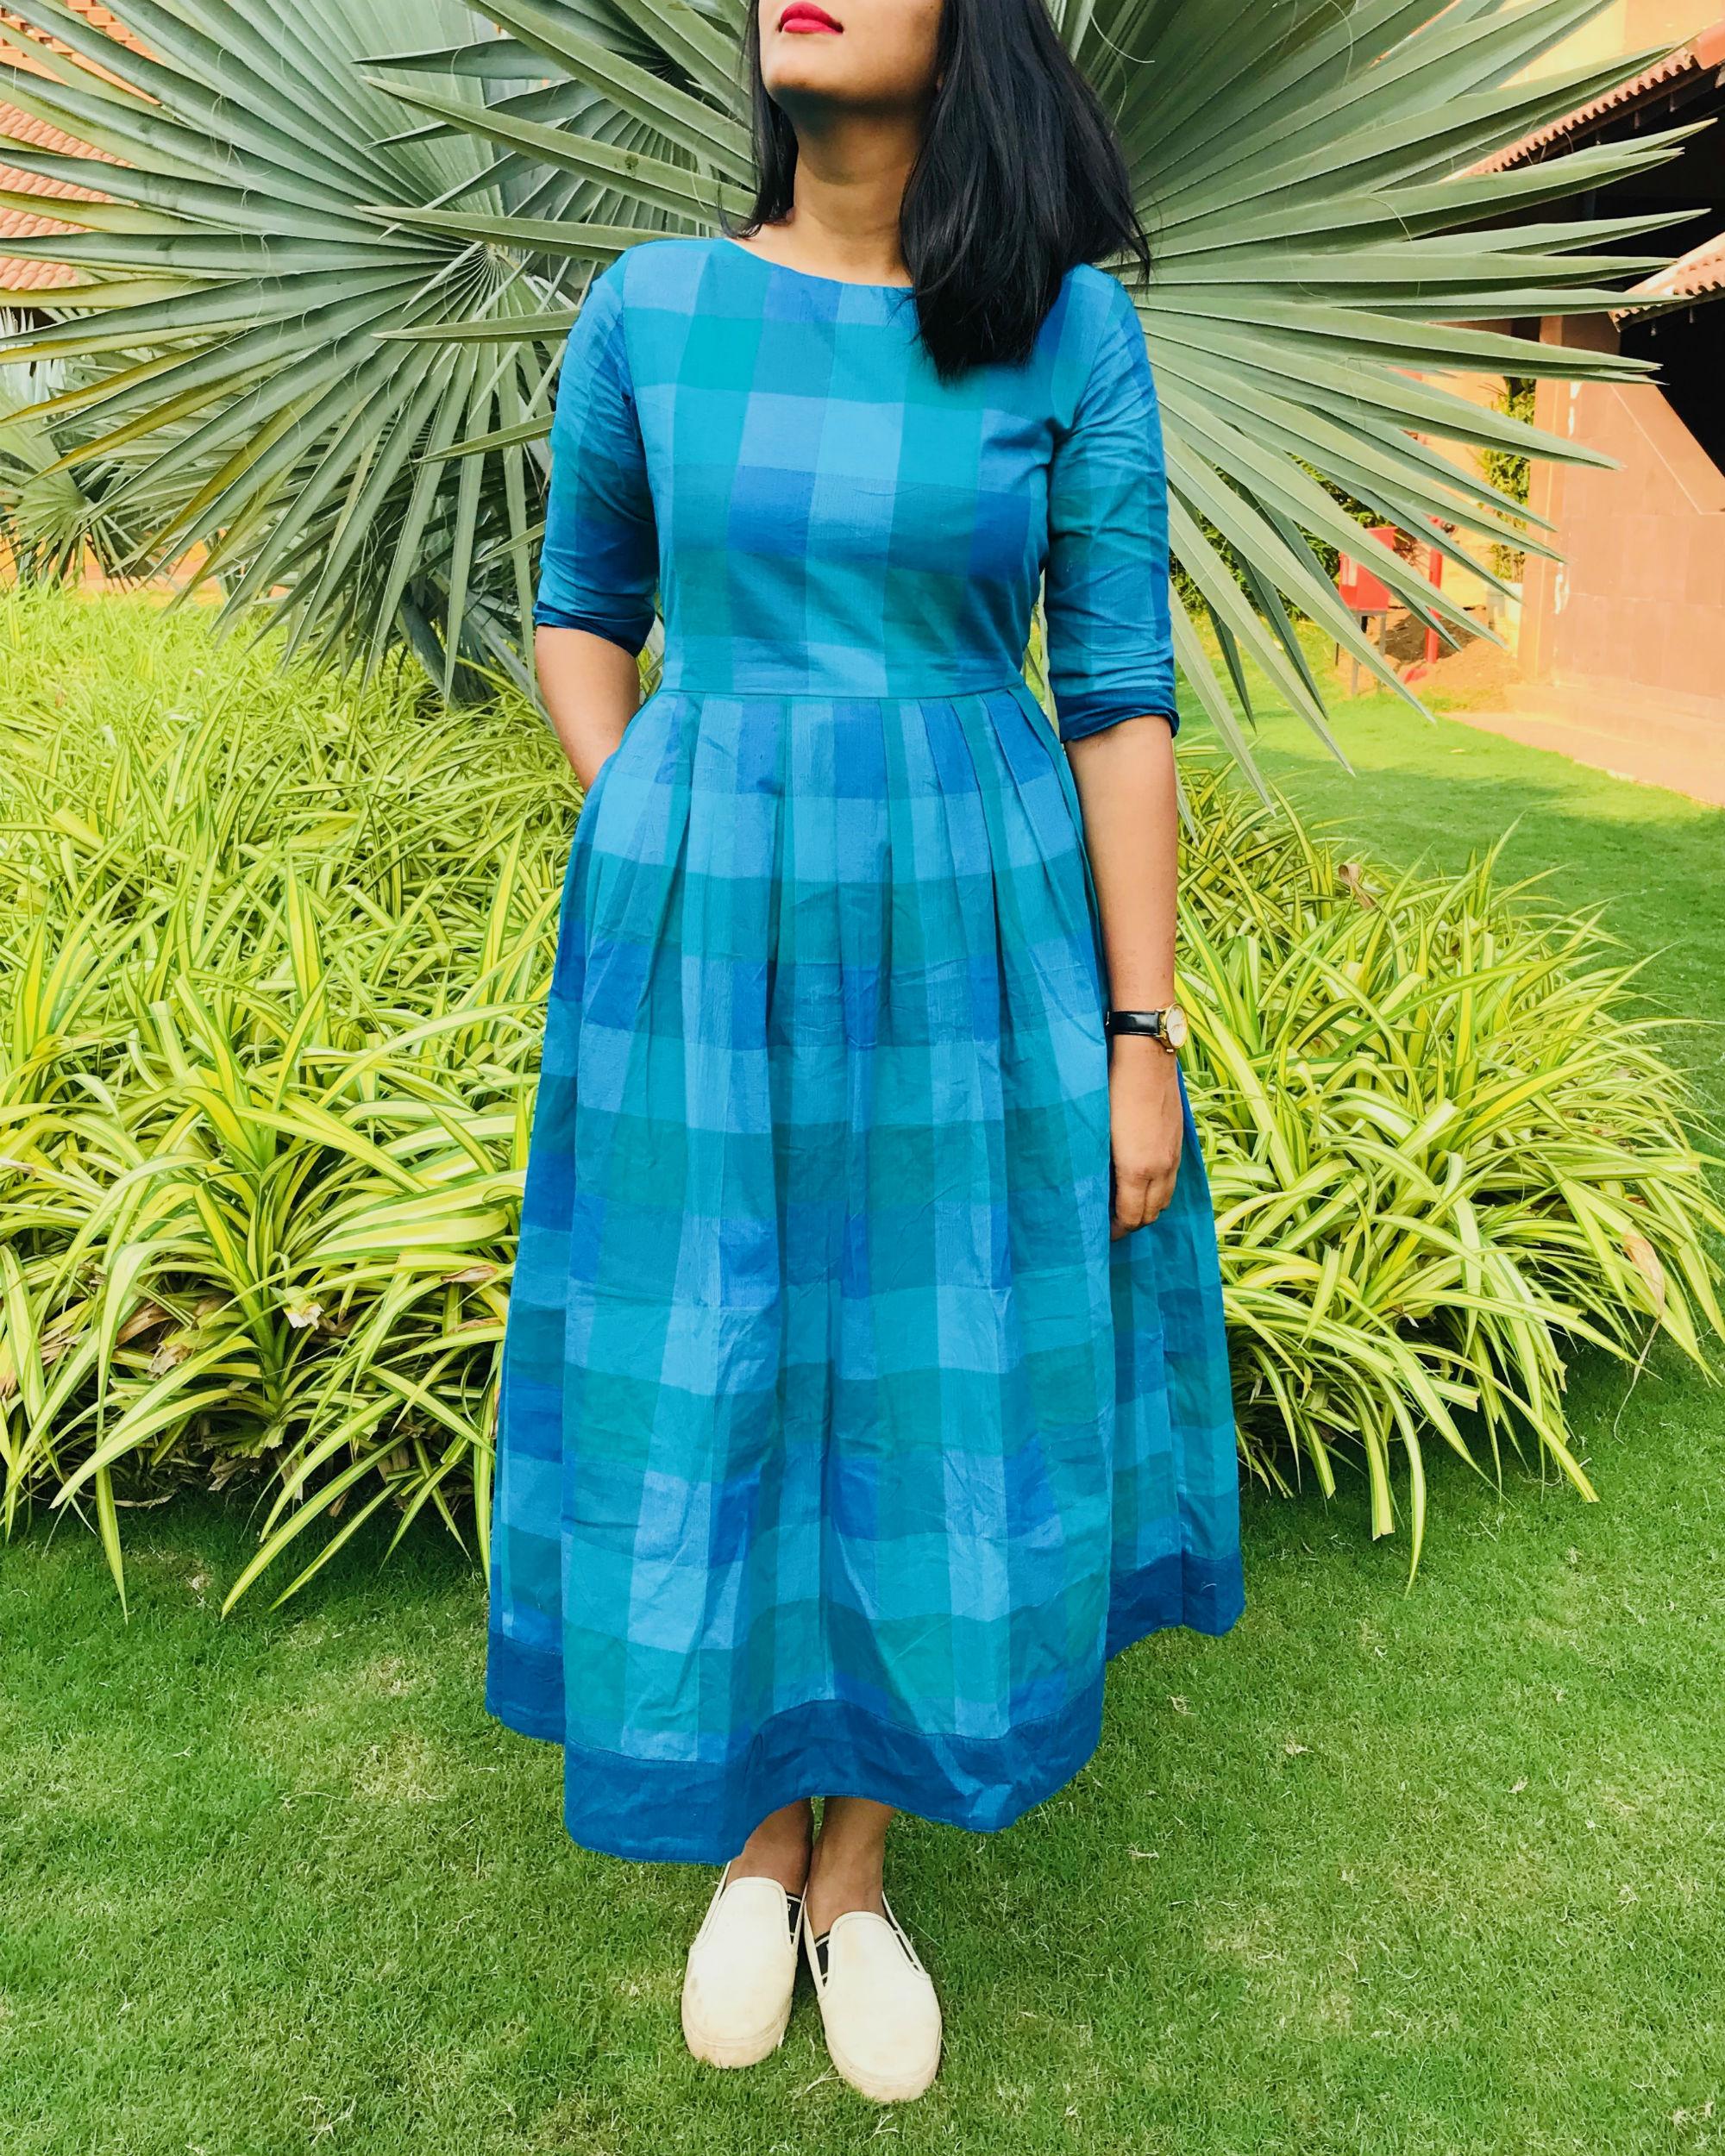 Shades Of Blue Checks Dress By Threeness The Secret Label